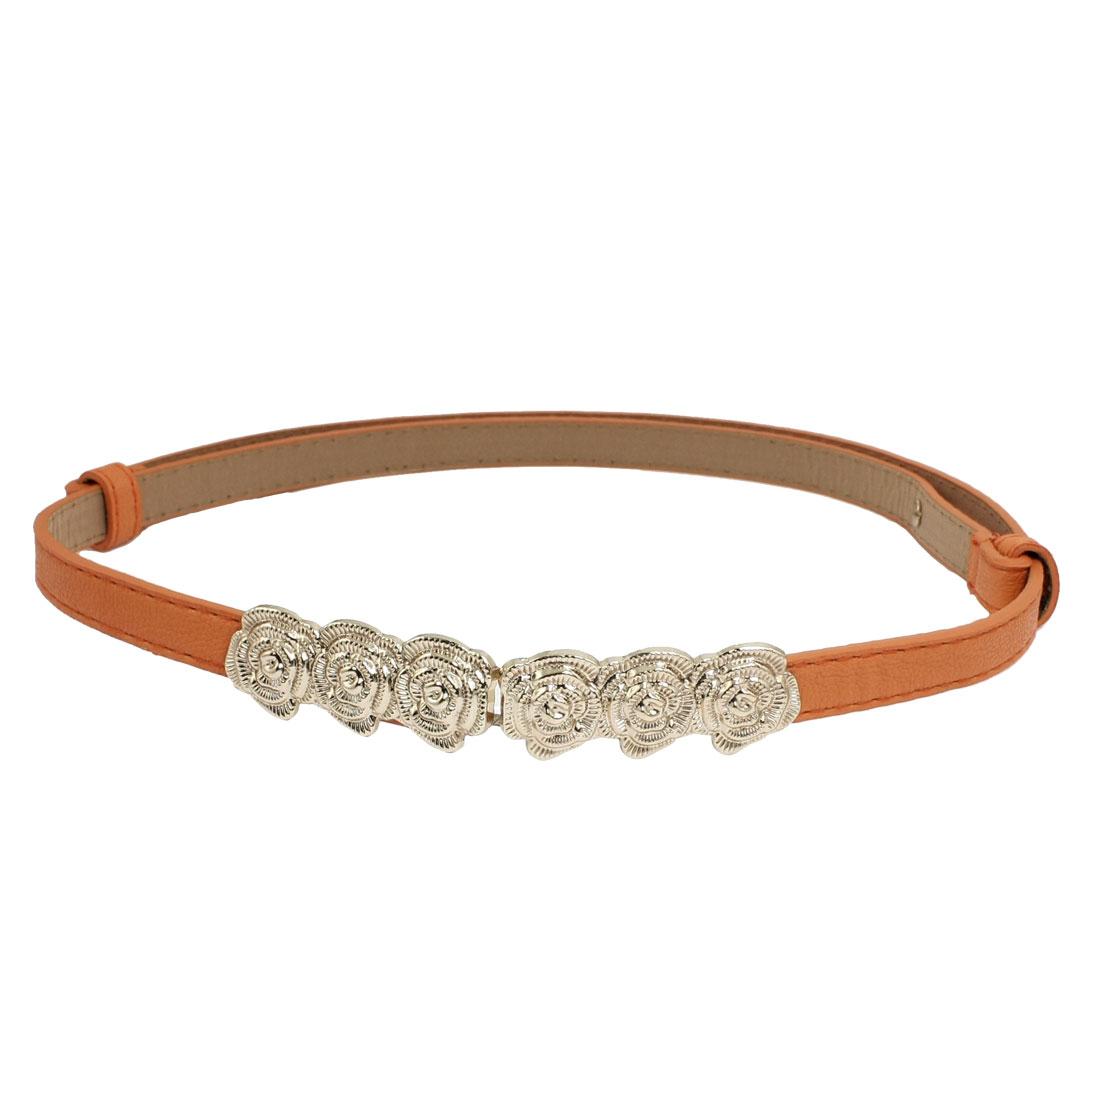 Rose Buckle Faux Leather Lichee Pattern Women Waist Belt Waistband Orange